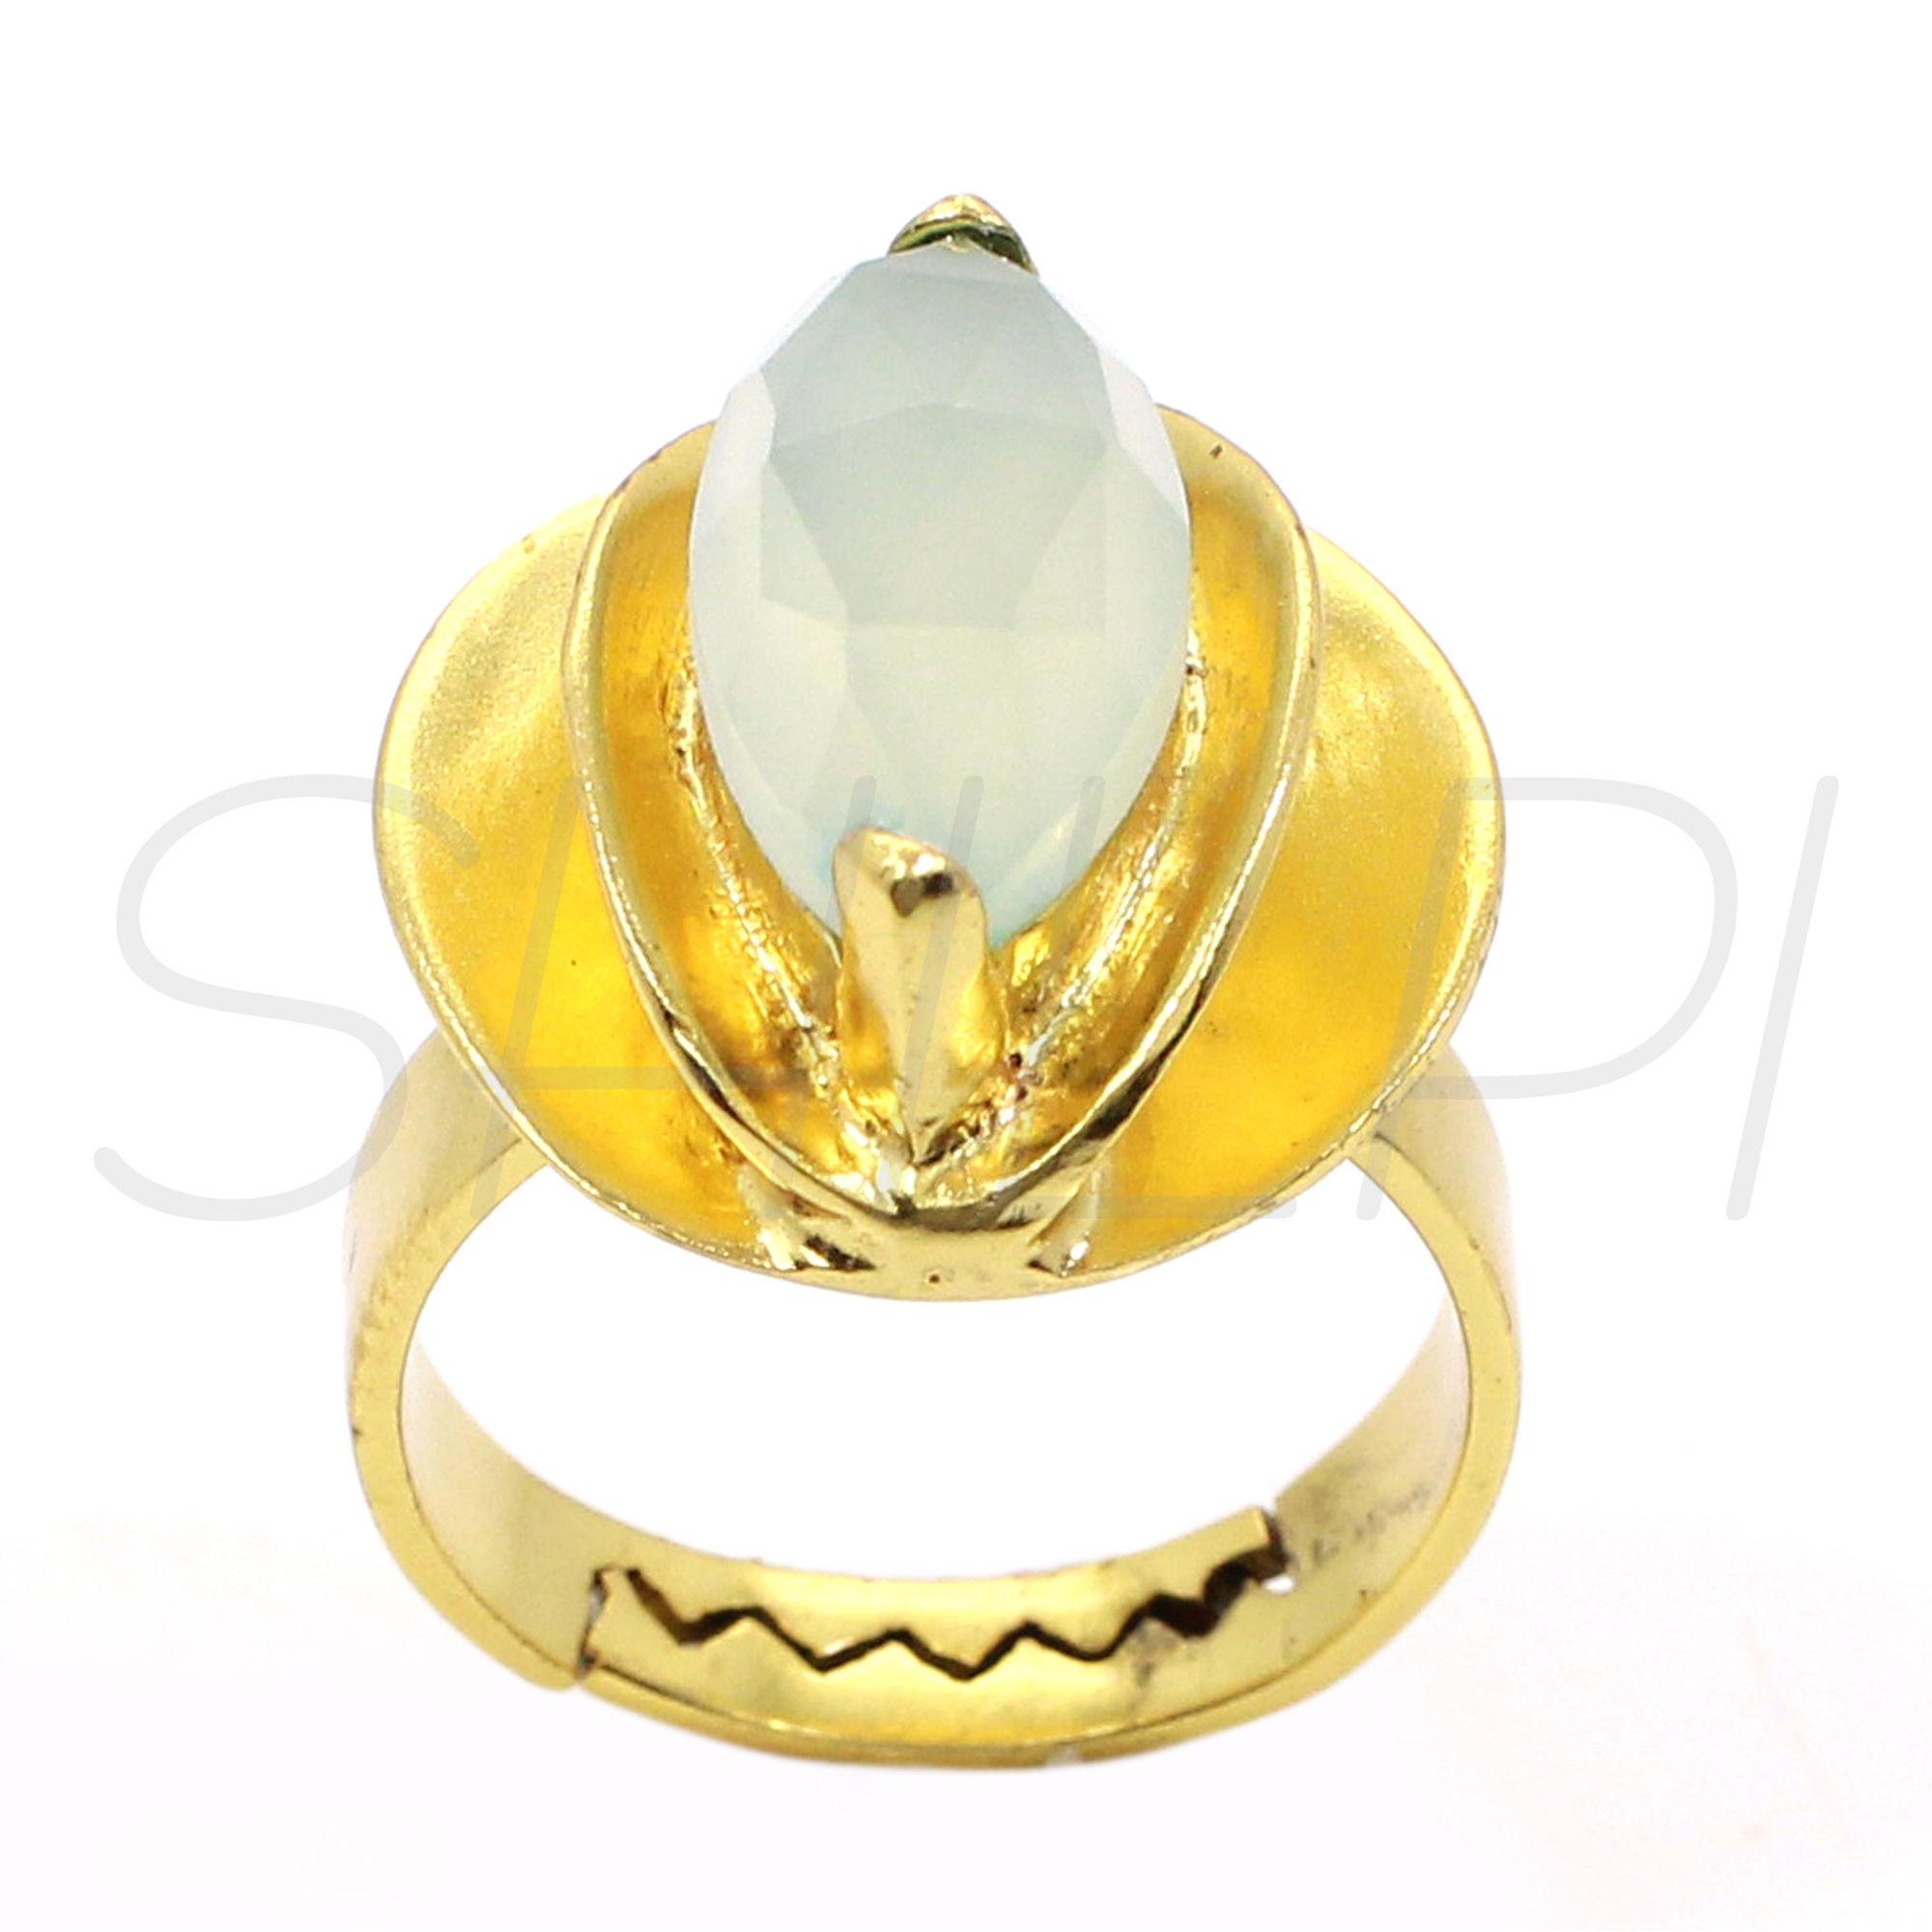 Aqua Chalcedony Gold Plated Handmade Adjustable Ring